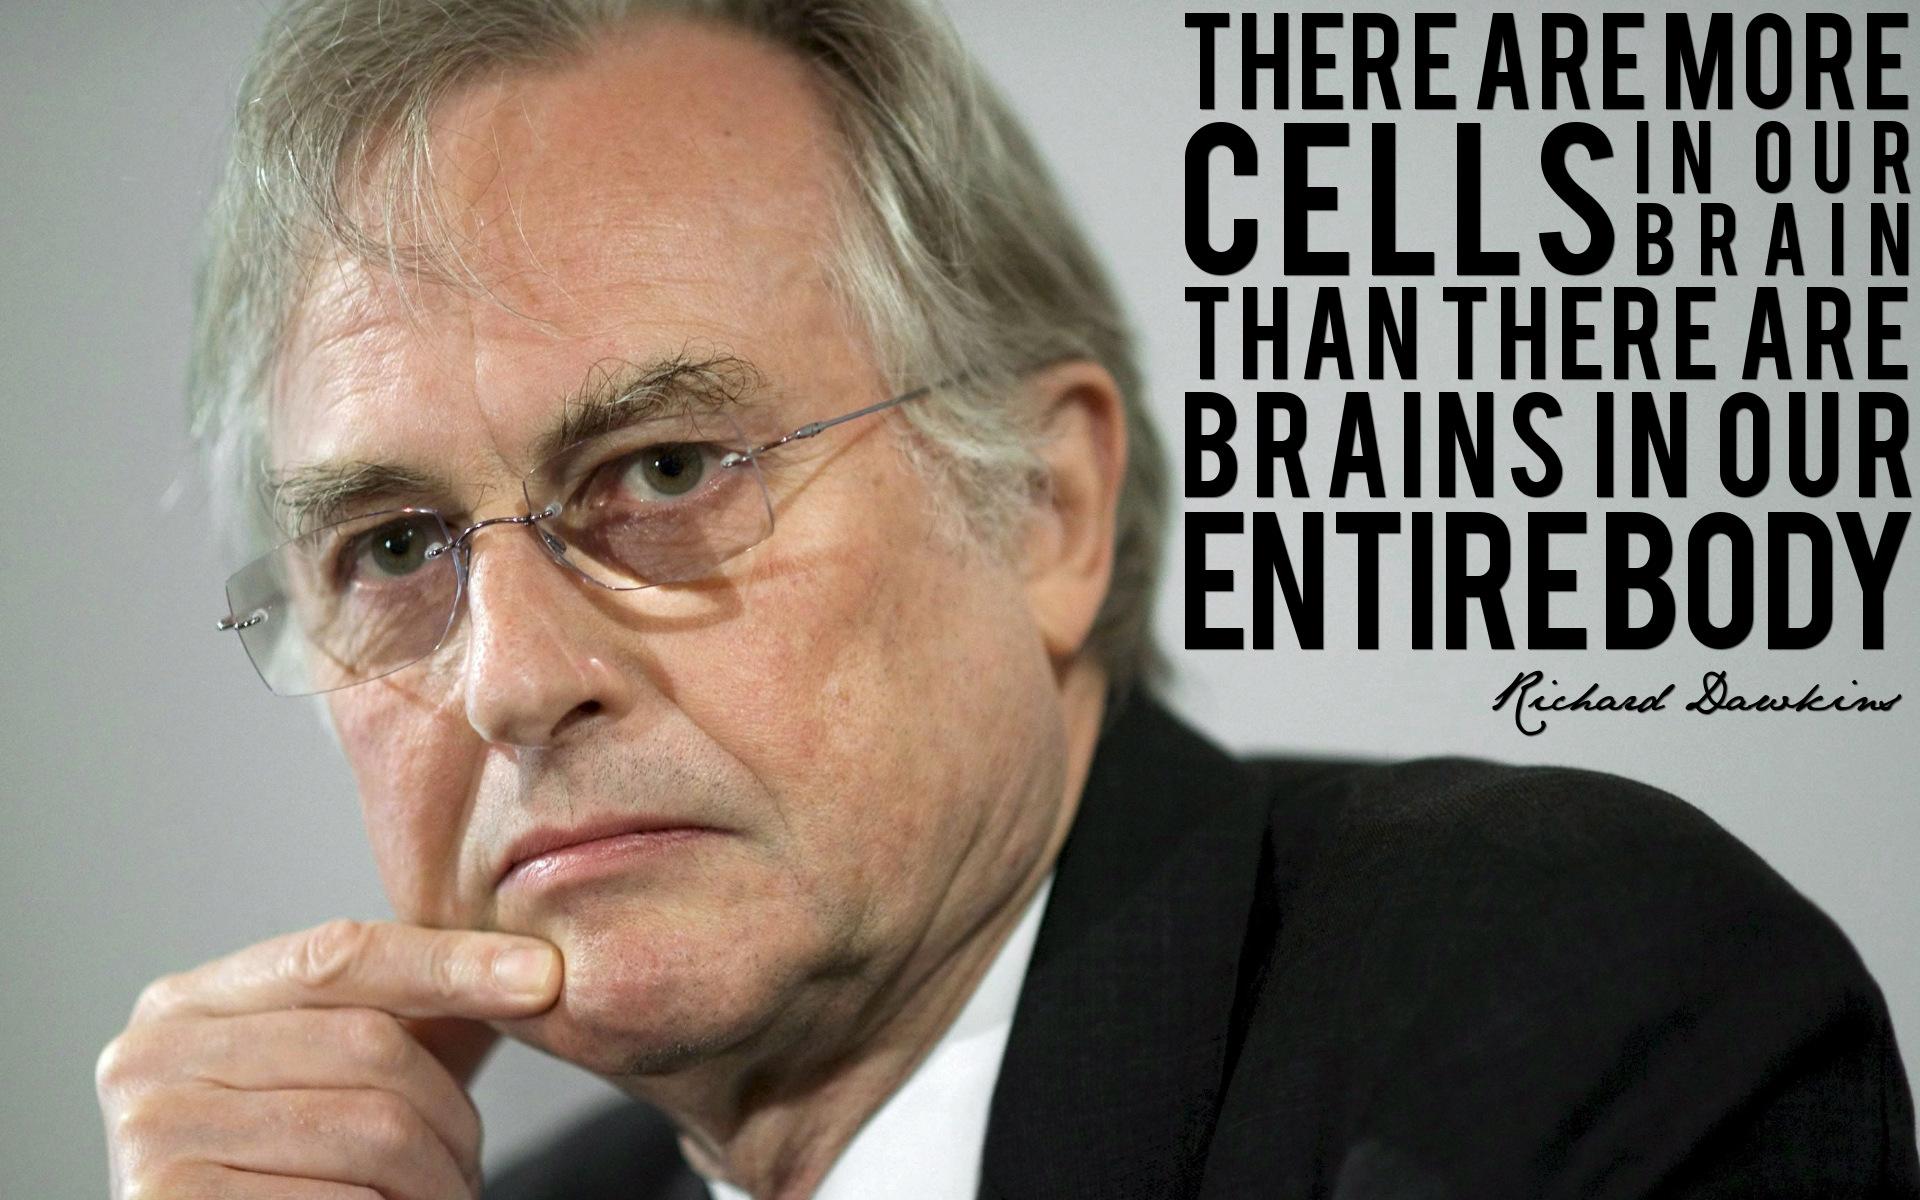 Richard Dawkins, Face, Cells, Brain HD large resolution desktop theme